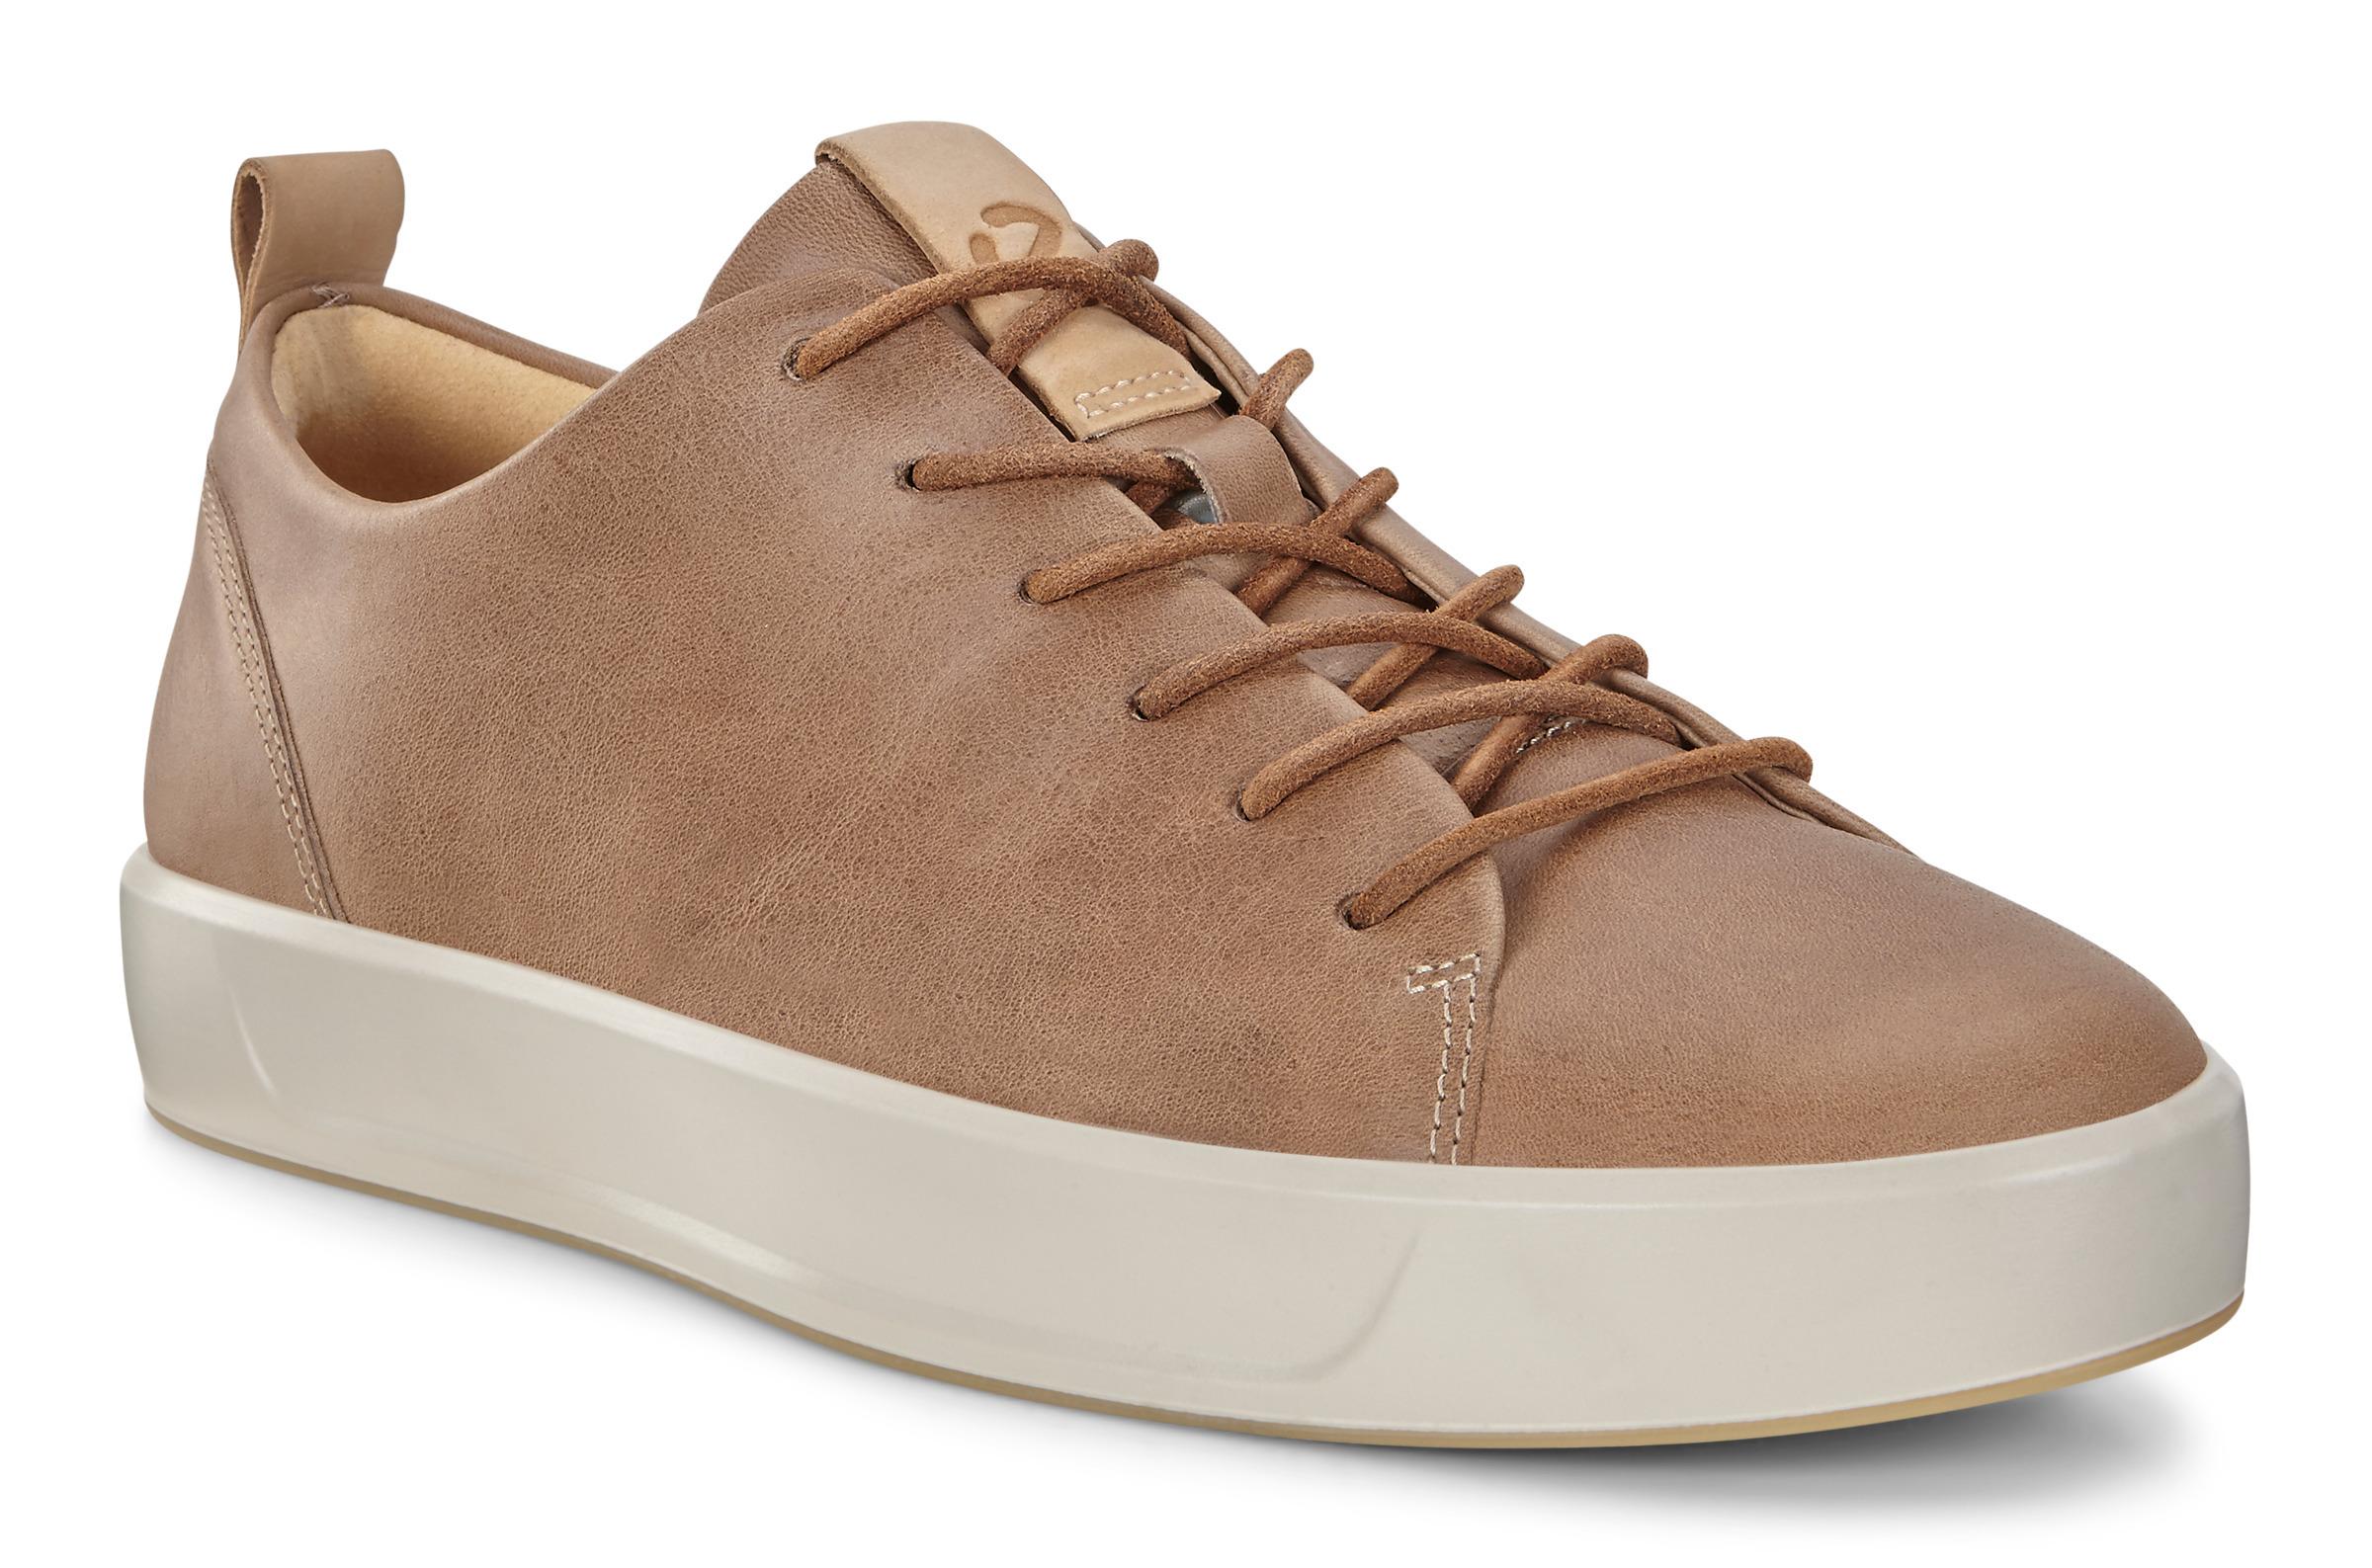 Auslaufmodelle Ecco Auslaufmodelle Ecco Schuhe Auslaufmodelle Herren Herren Schuhe Schuhe Herren QdshCBtrx